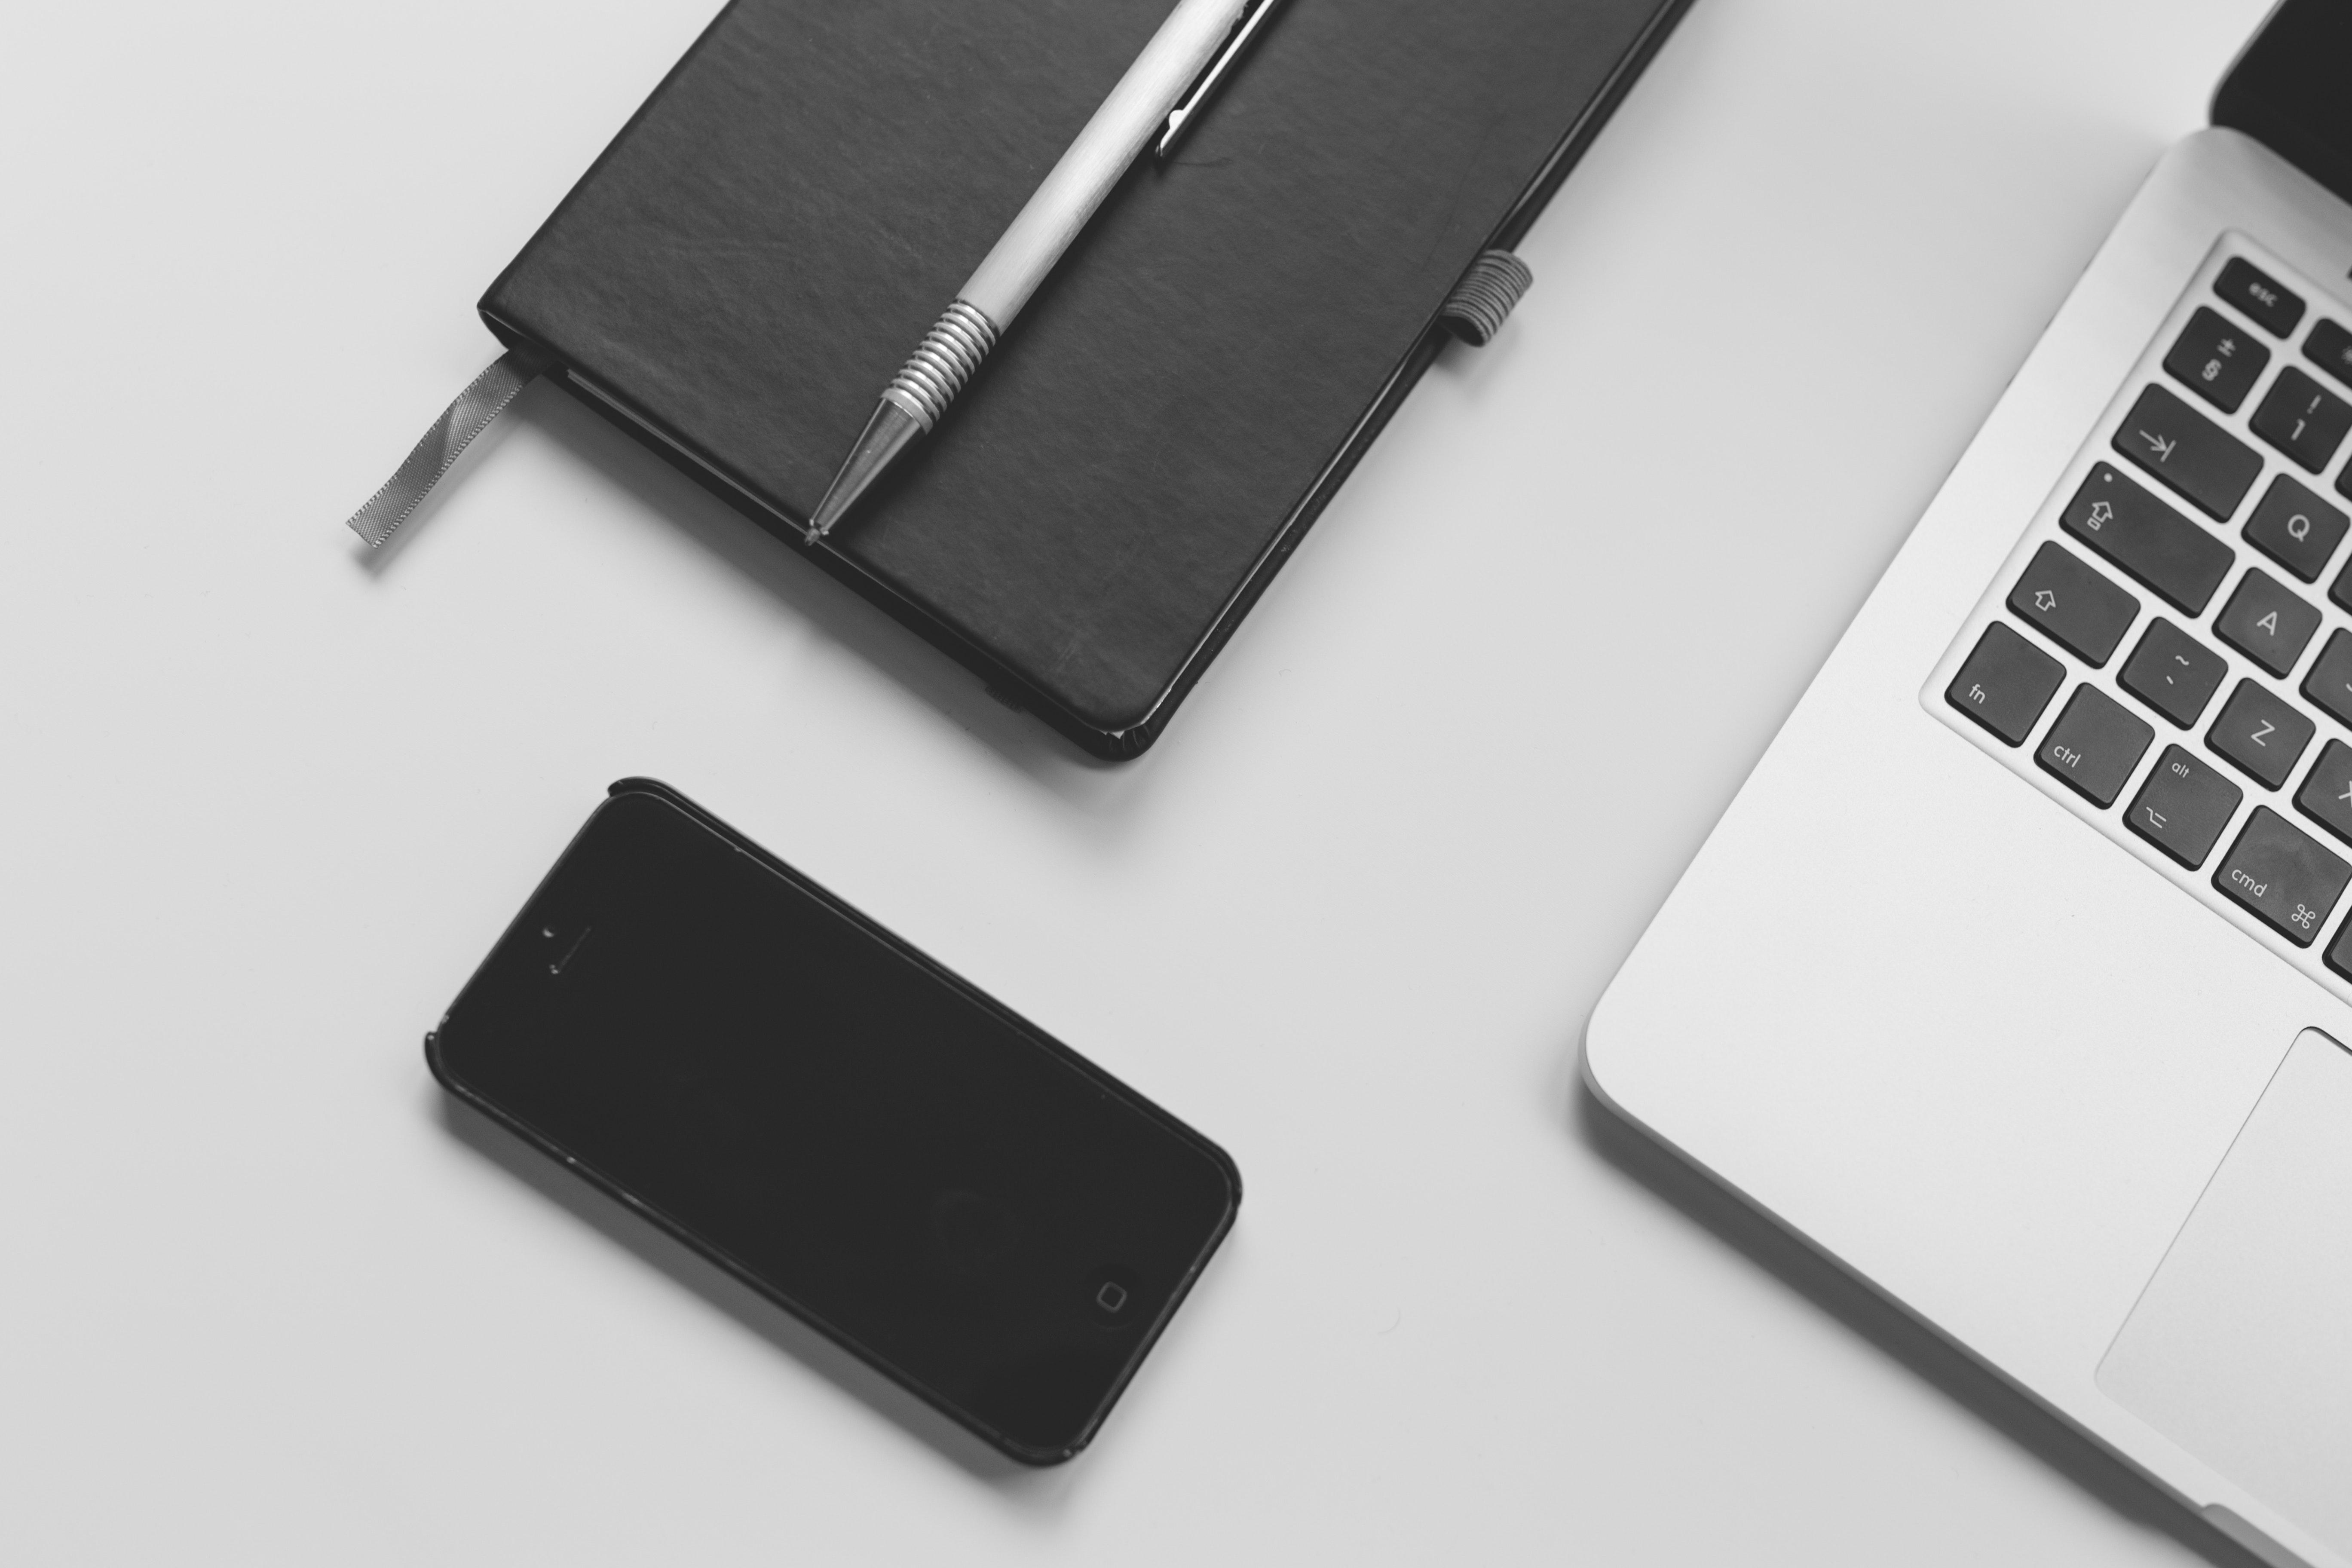 Black Iphone 5 Near Macbook Pro, Blogging, Business, Computer, Copywriting, HQ Photo